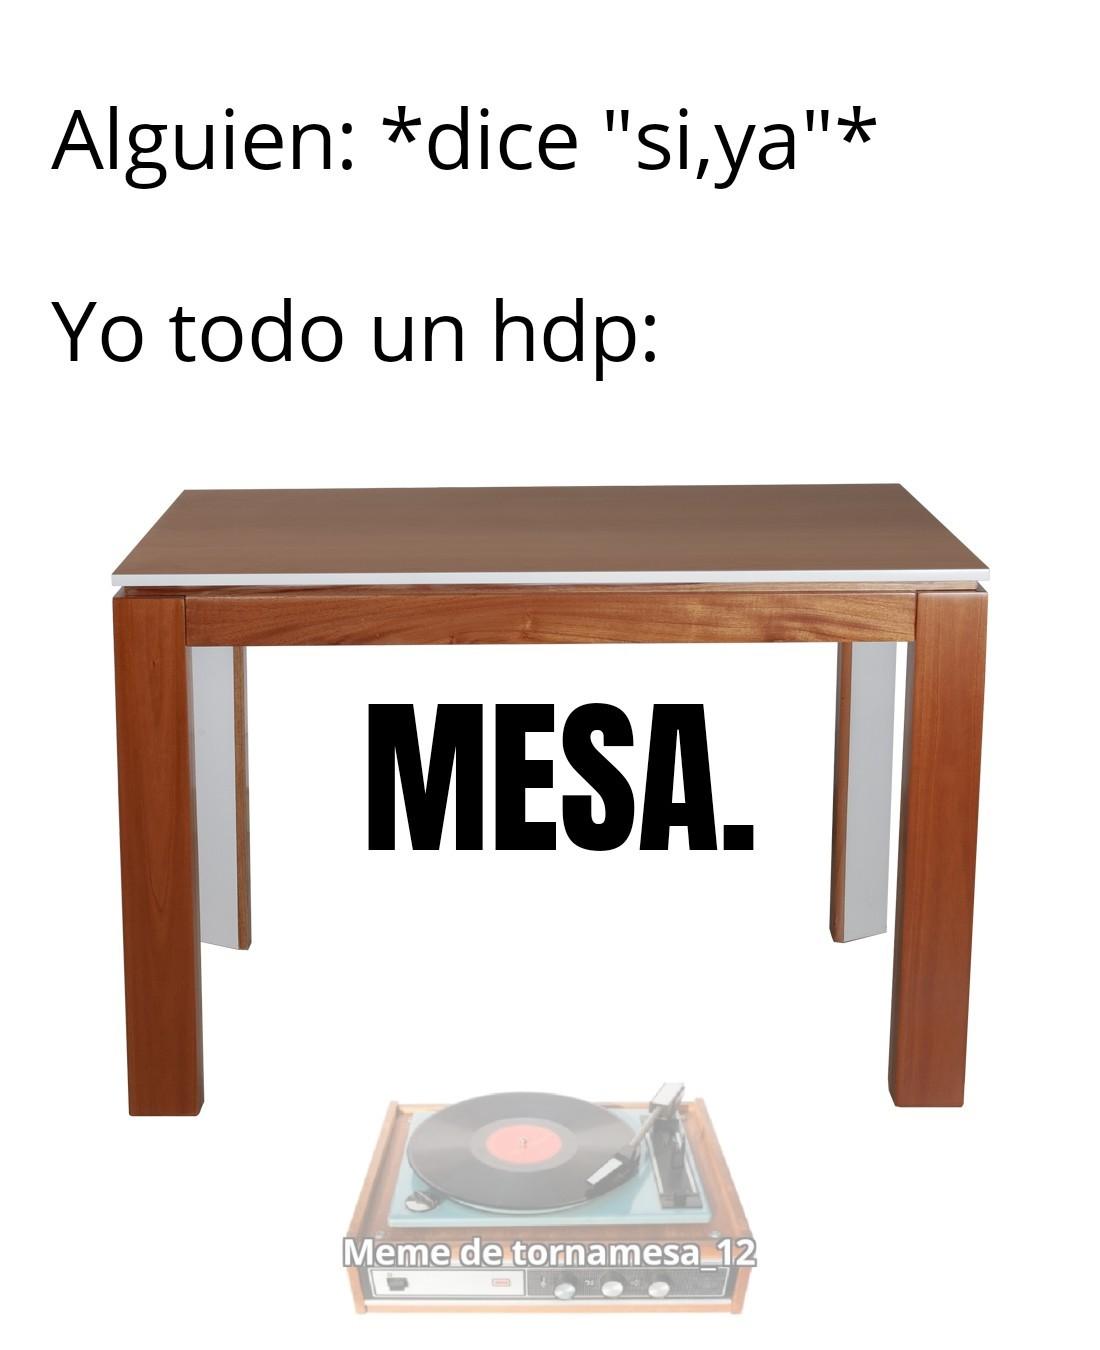 MESA. - meme